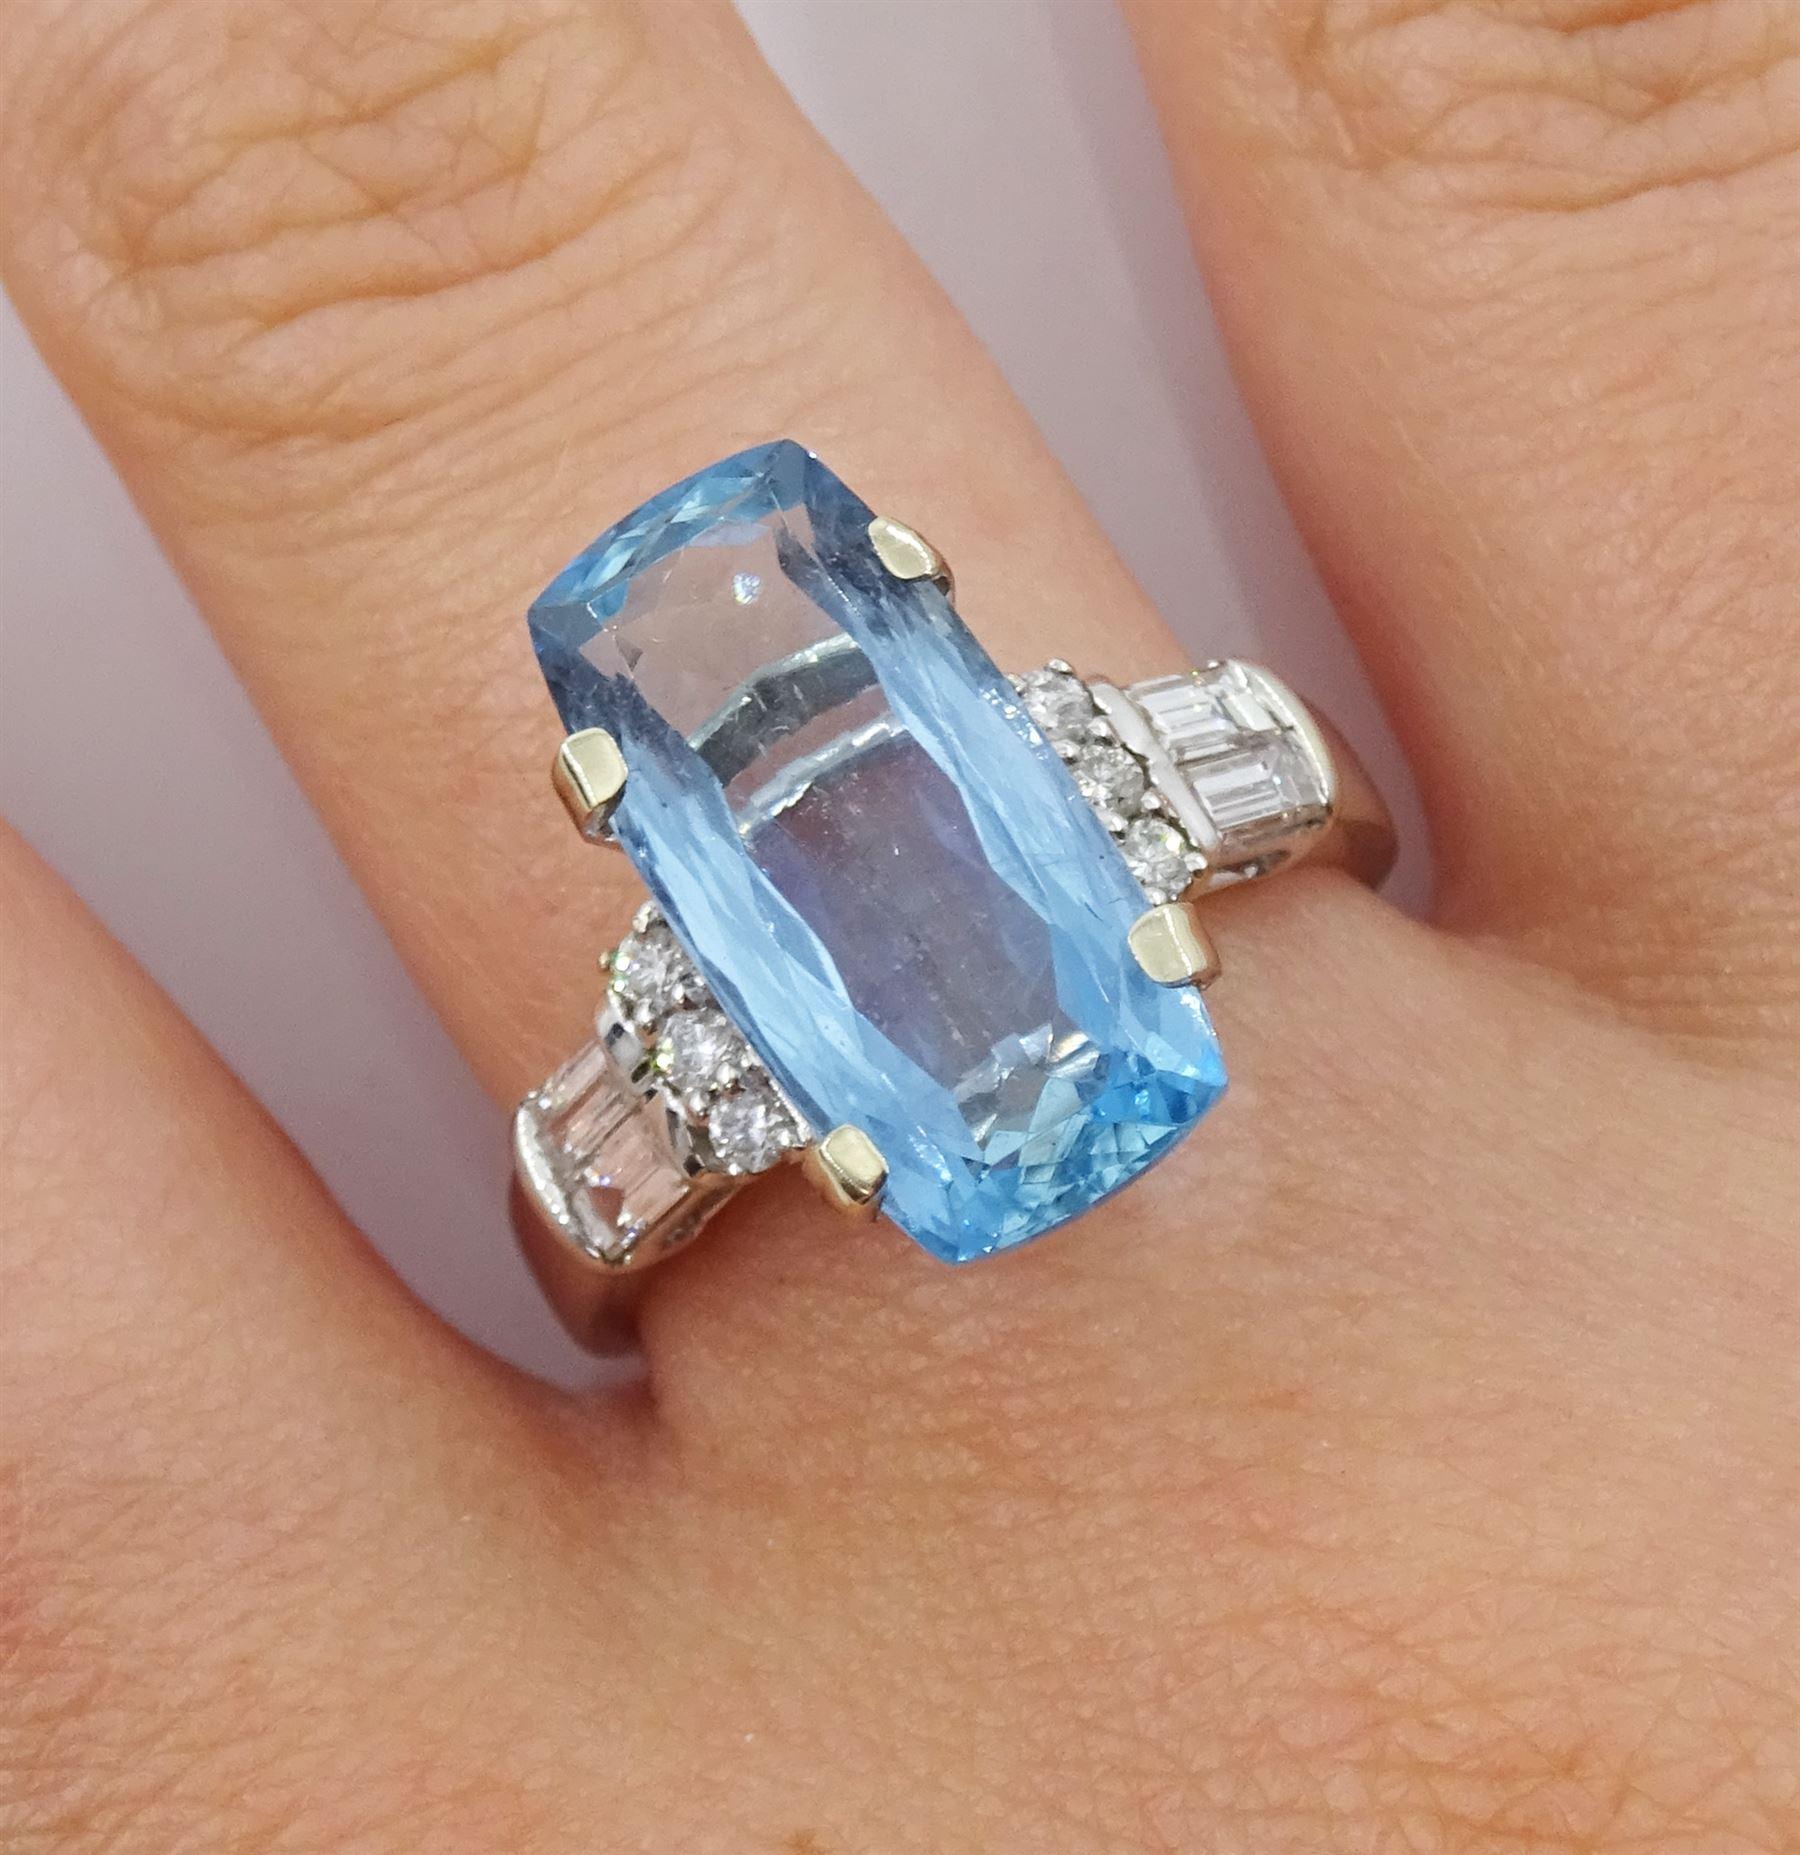 18ct white gold aquamarine ring - Image 2 of 4